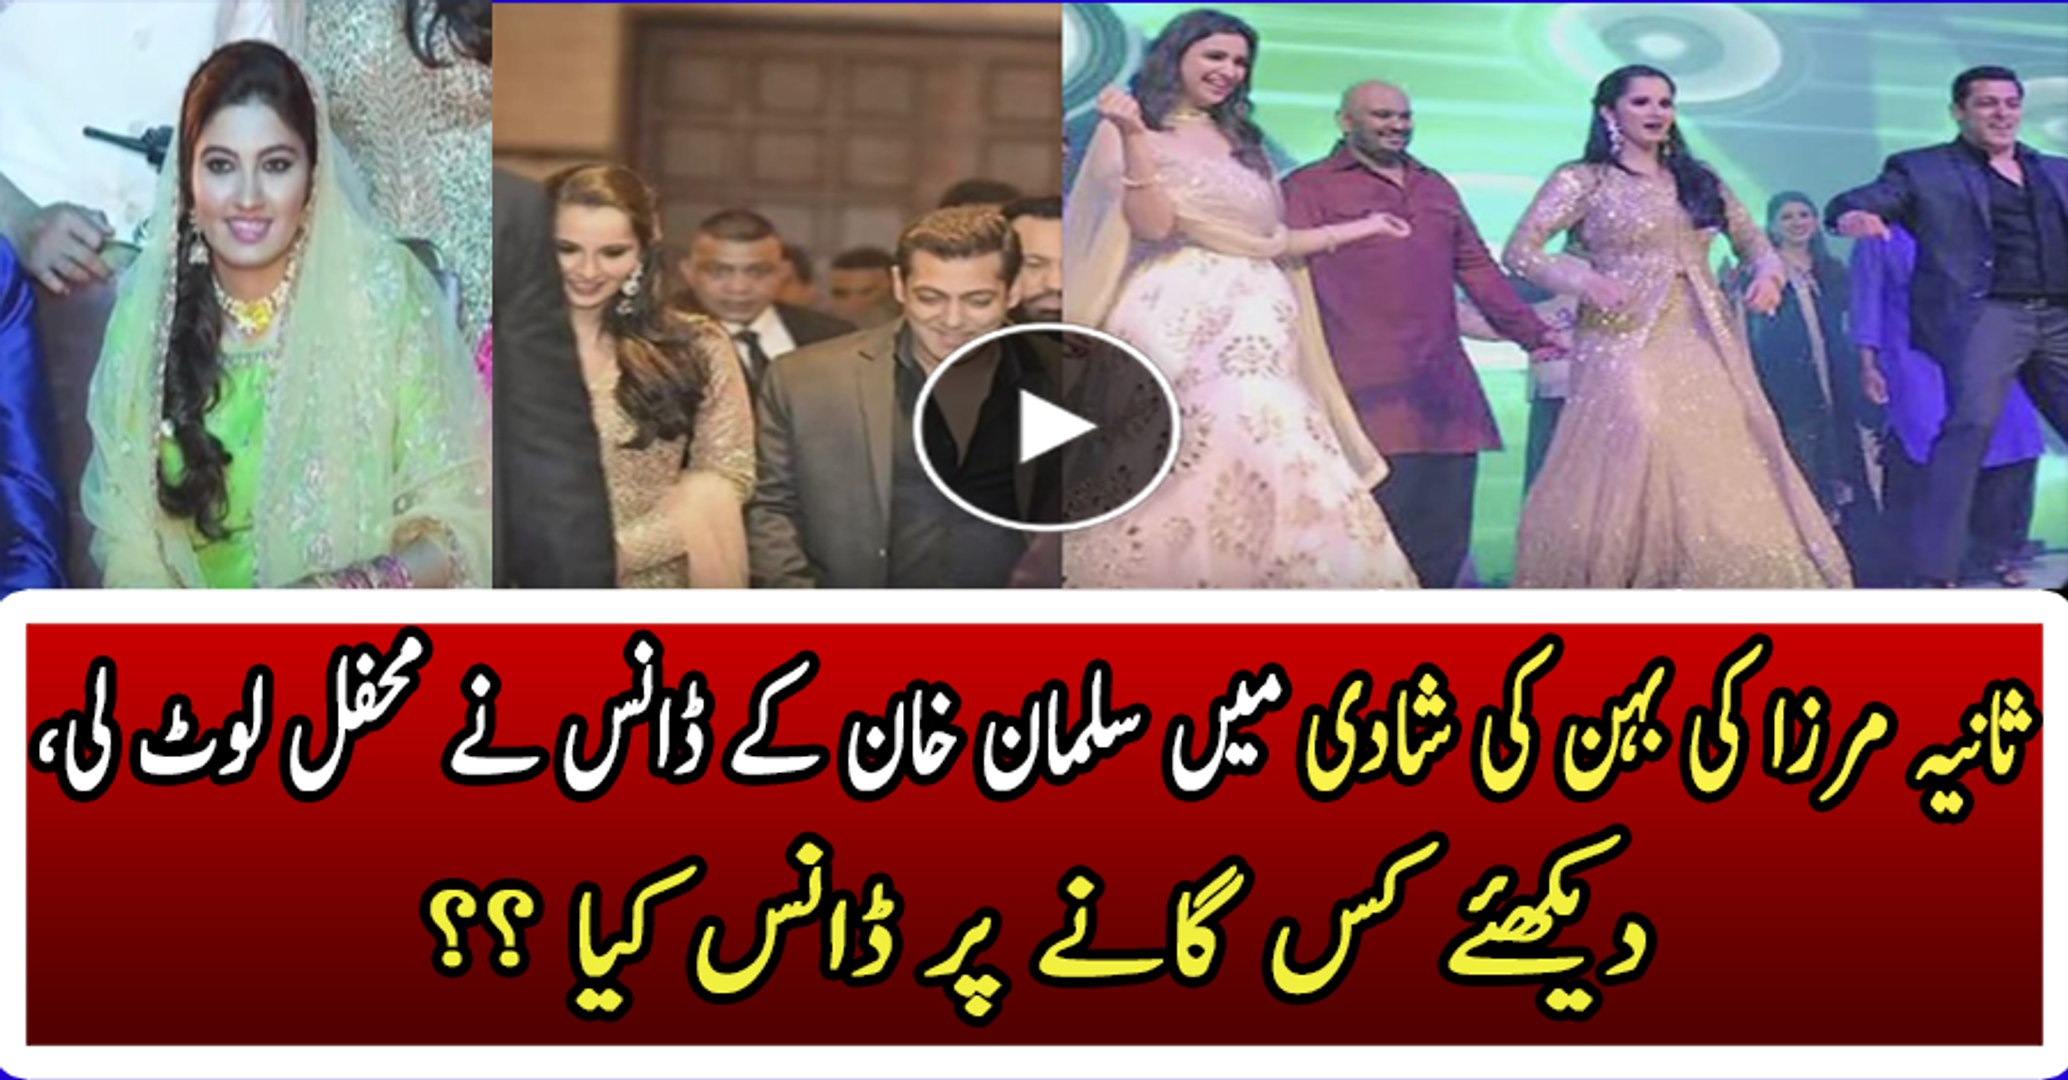 Salman Khan Dances At Sania Mirza Sister s Sangeet